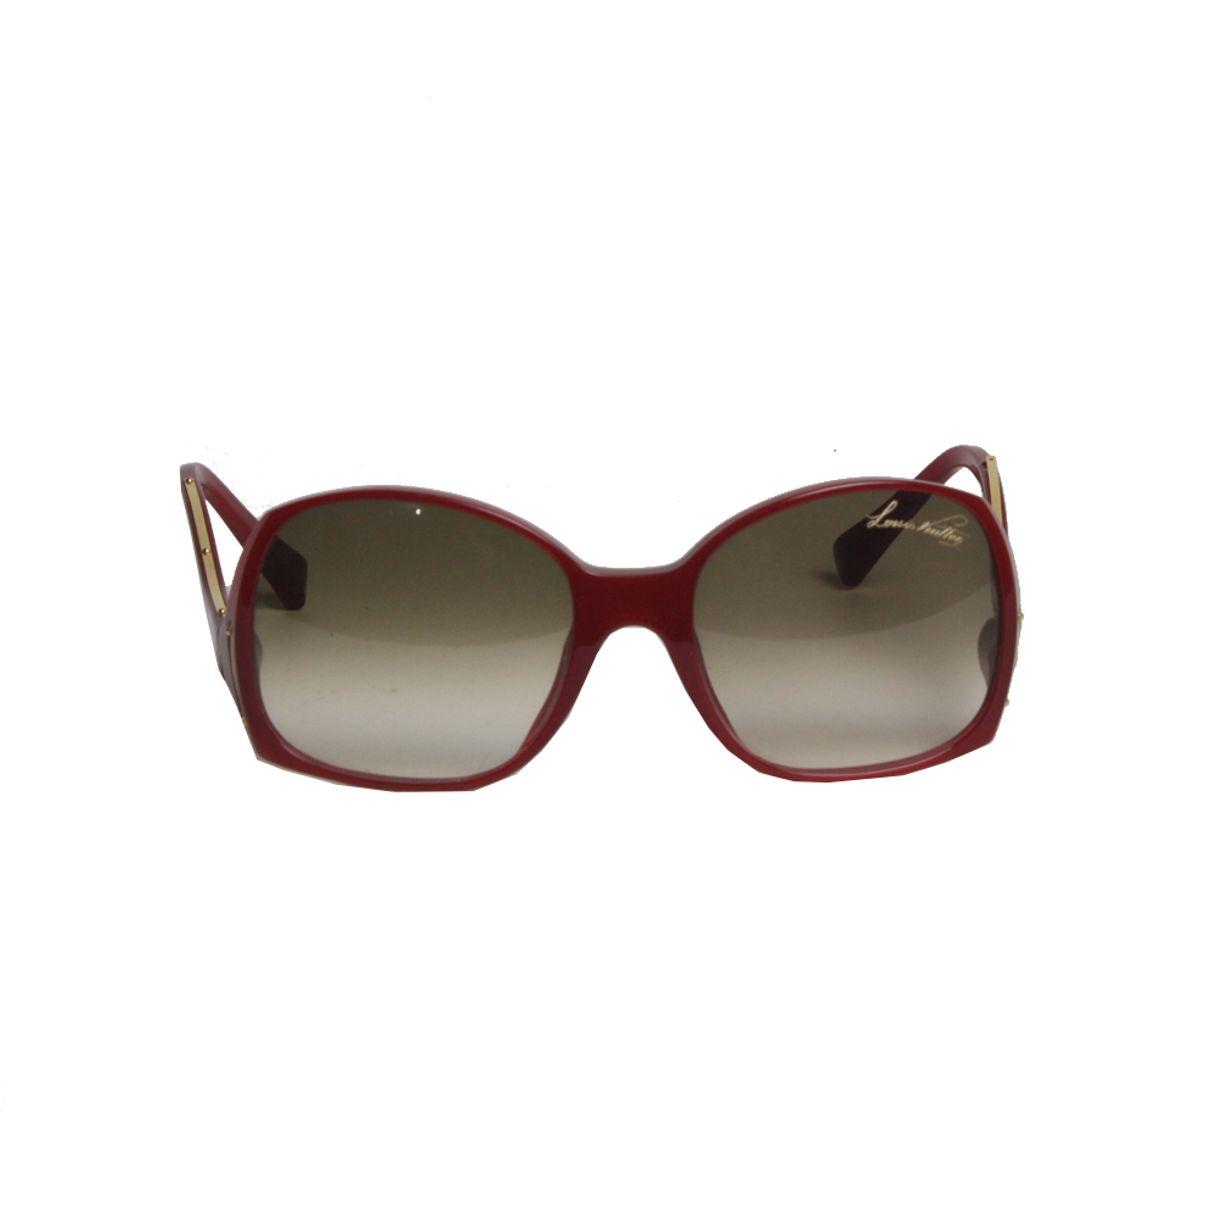 Oculos-Louis-Vuitton-Red